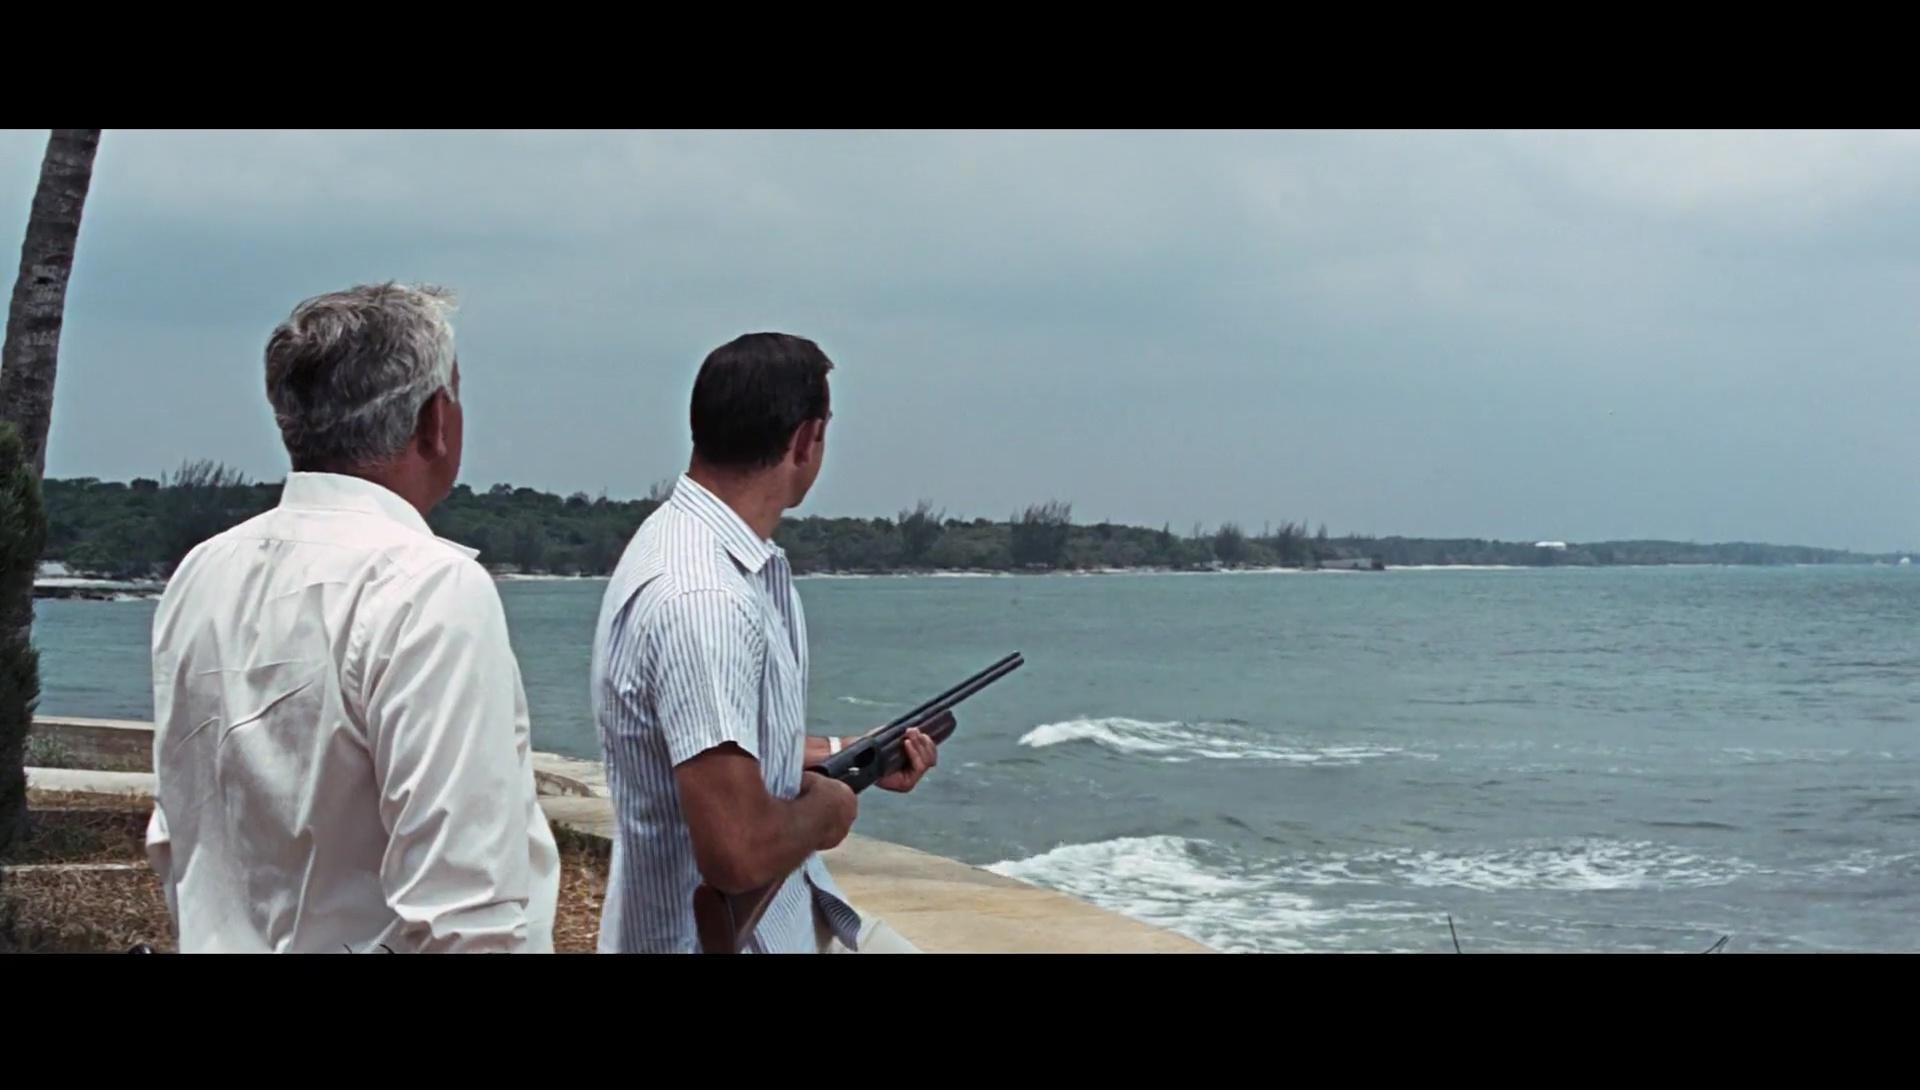 007 Operacion Trueno 1080p Lat-Cast-Ing 5.1 (1965)